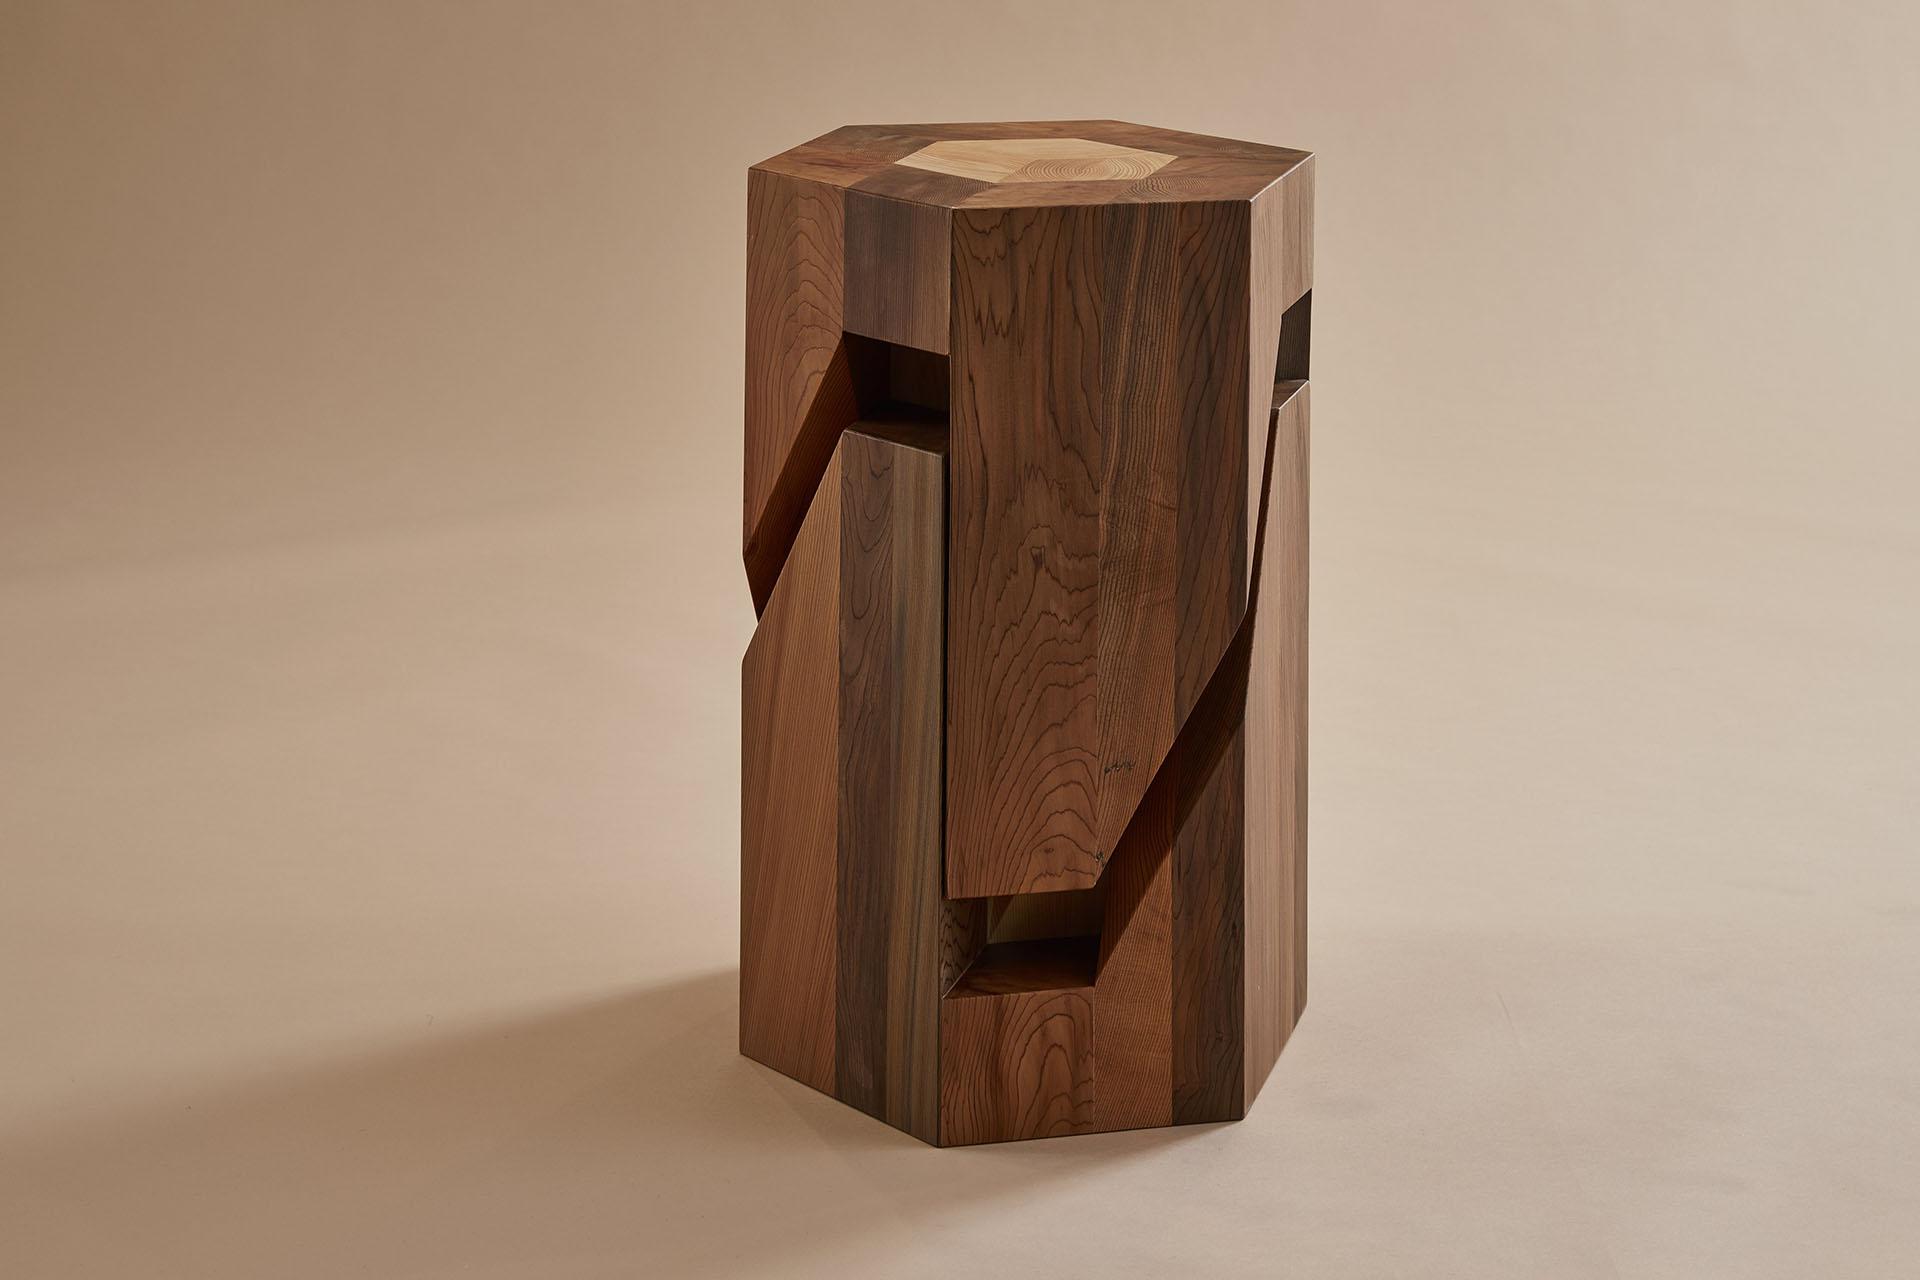 Sensational Japanese Puzzle Inspired Stools By Studio Tamen Plain Magazine Ibusinesslaw Wood Chair Design Ideas Ibusinesslaworg